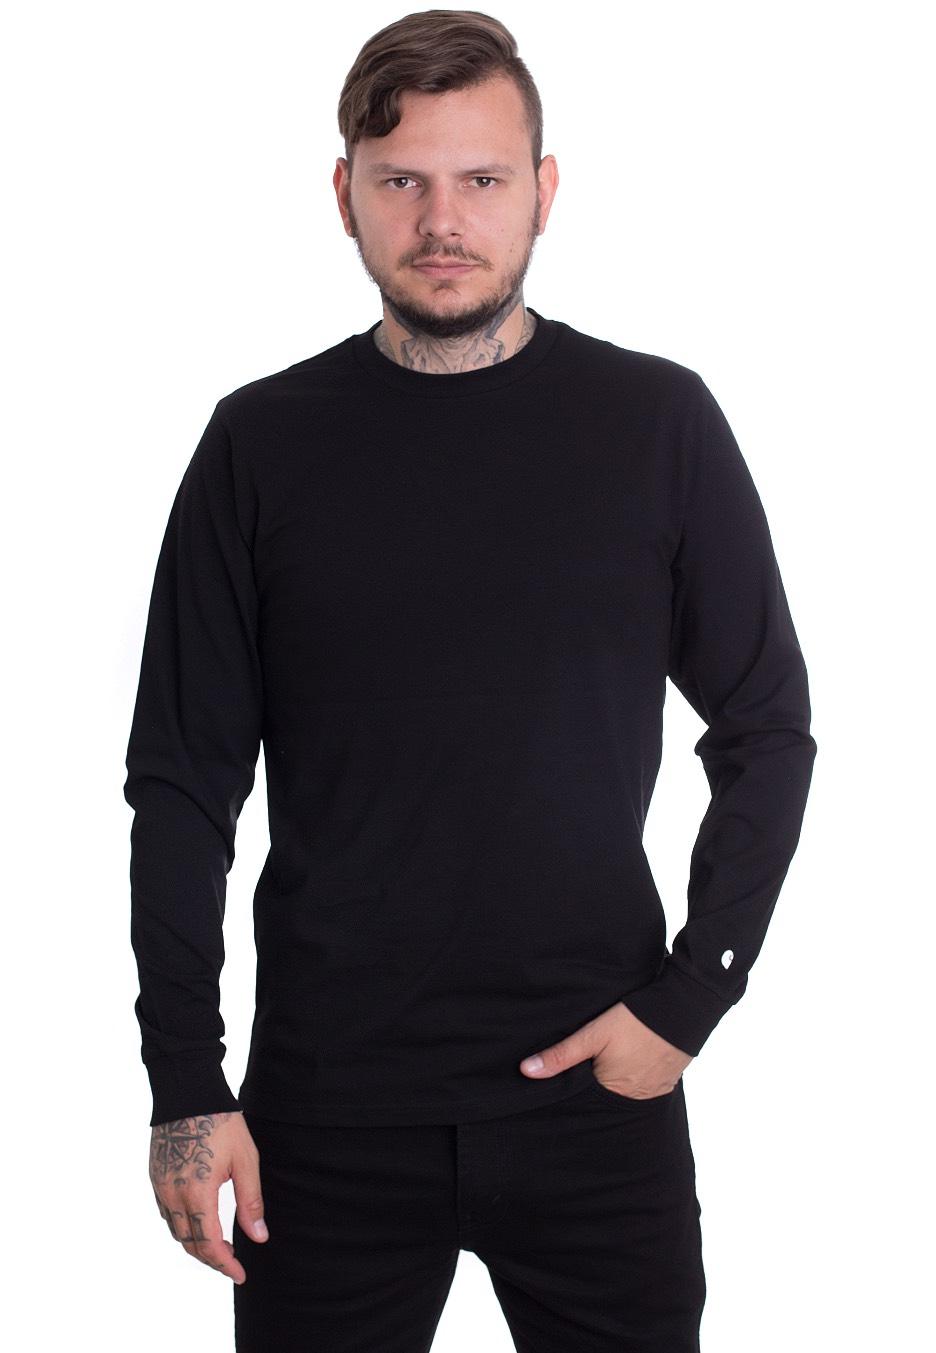 aa8448bf0eb5 Carhartt WIP - Base Black White - Longsleeve - Streetwear Shop -  Impericon.com UK